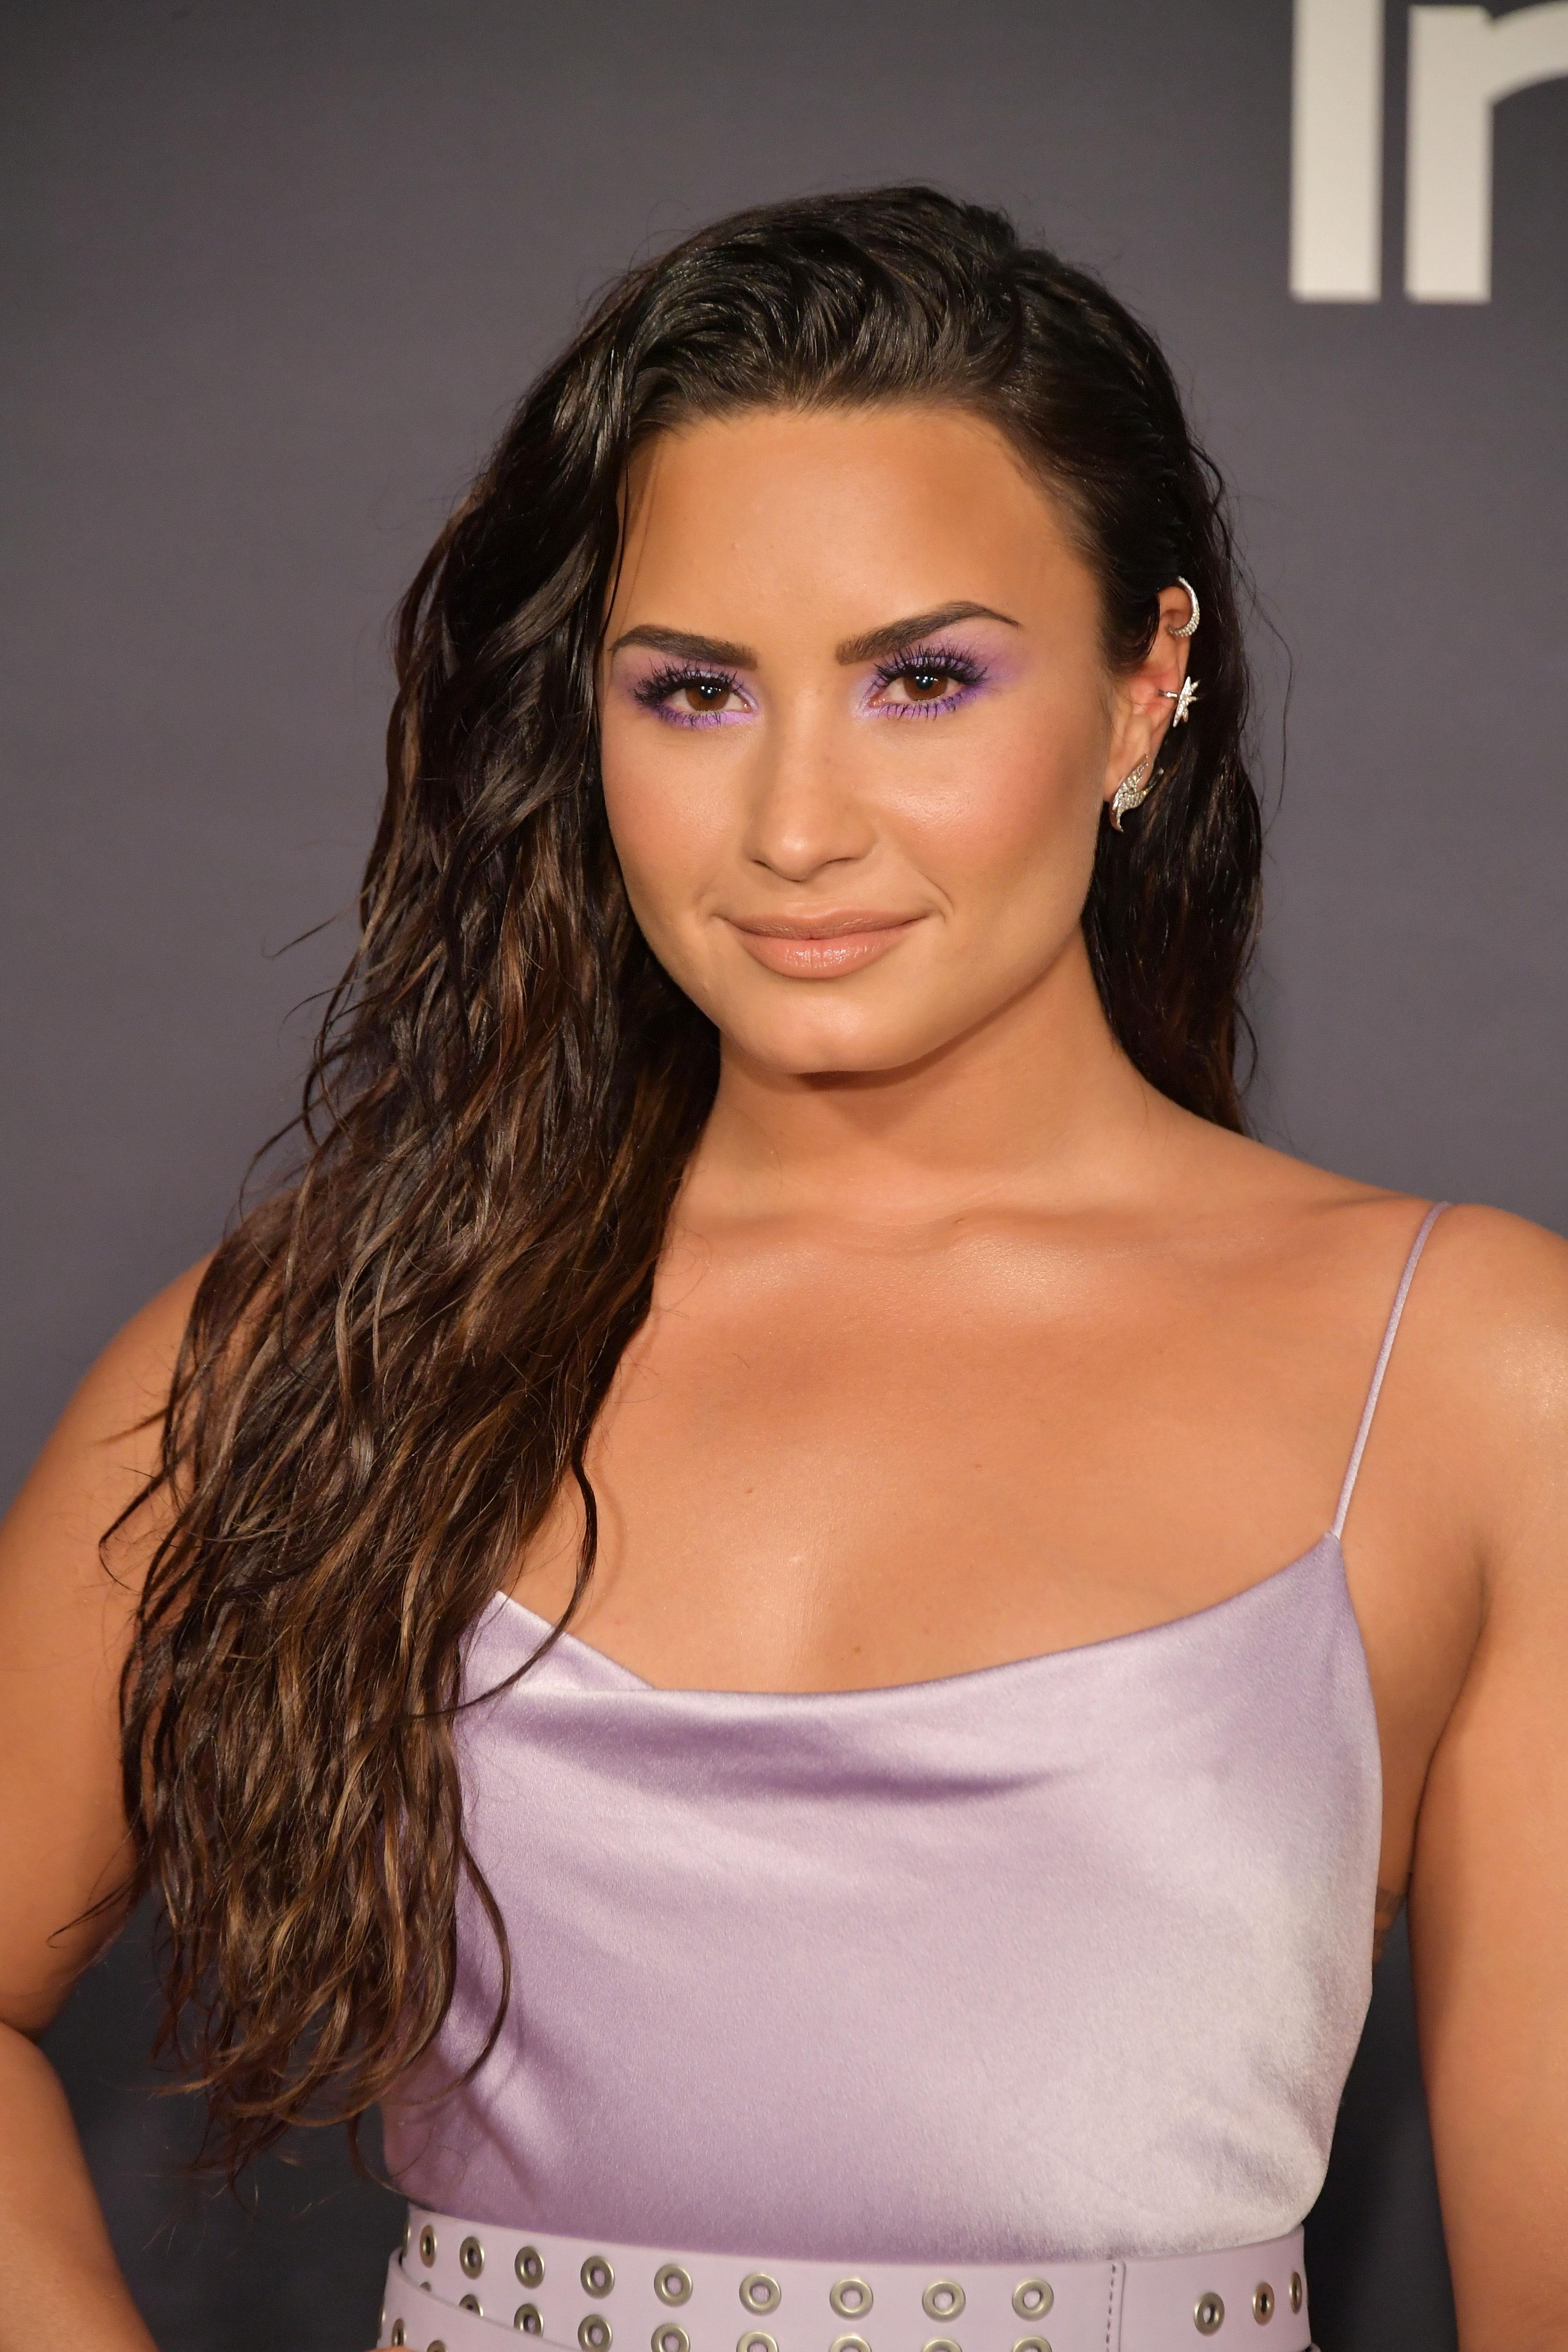 Lilac Demi Lovato 3rd Instyle Awards 1 Satiny